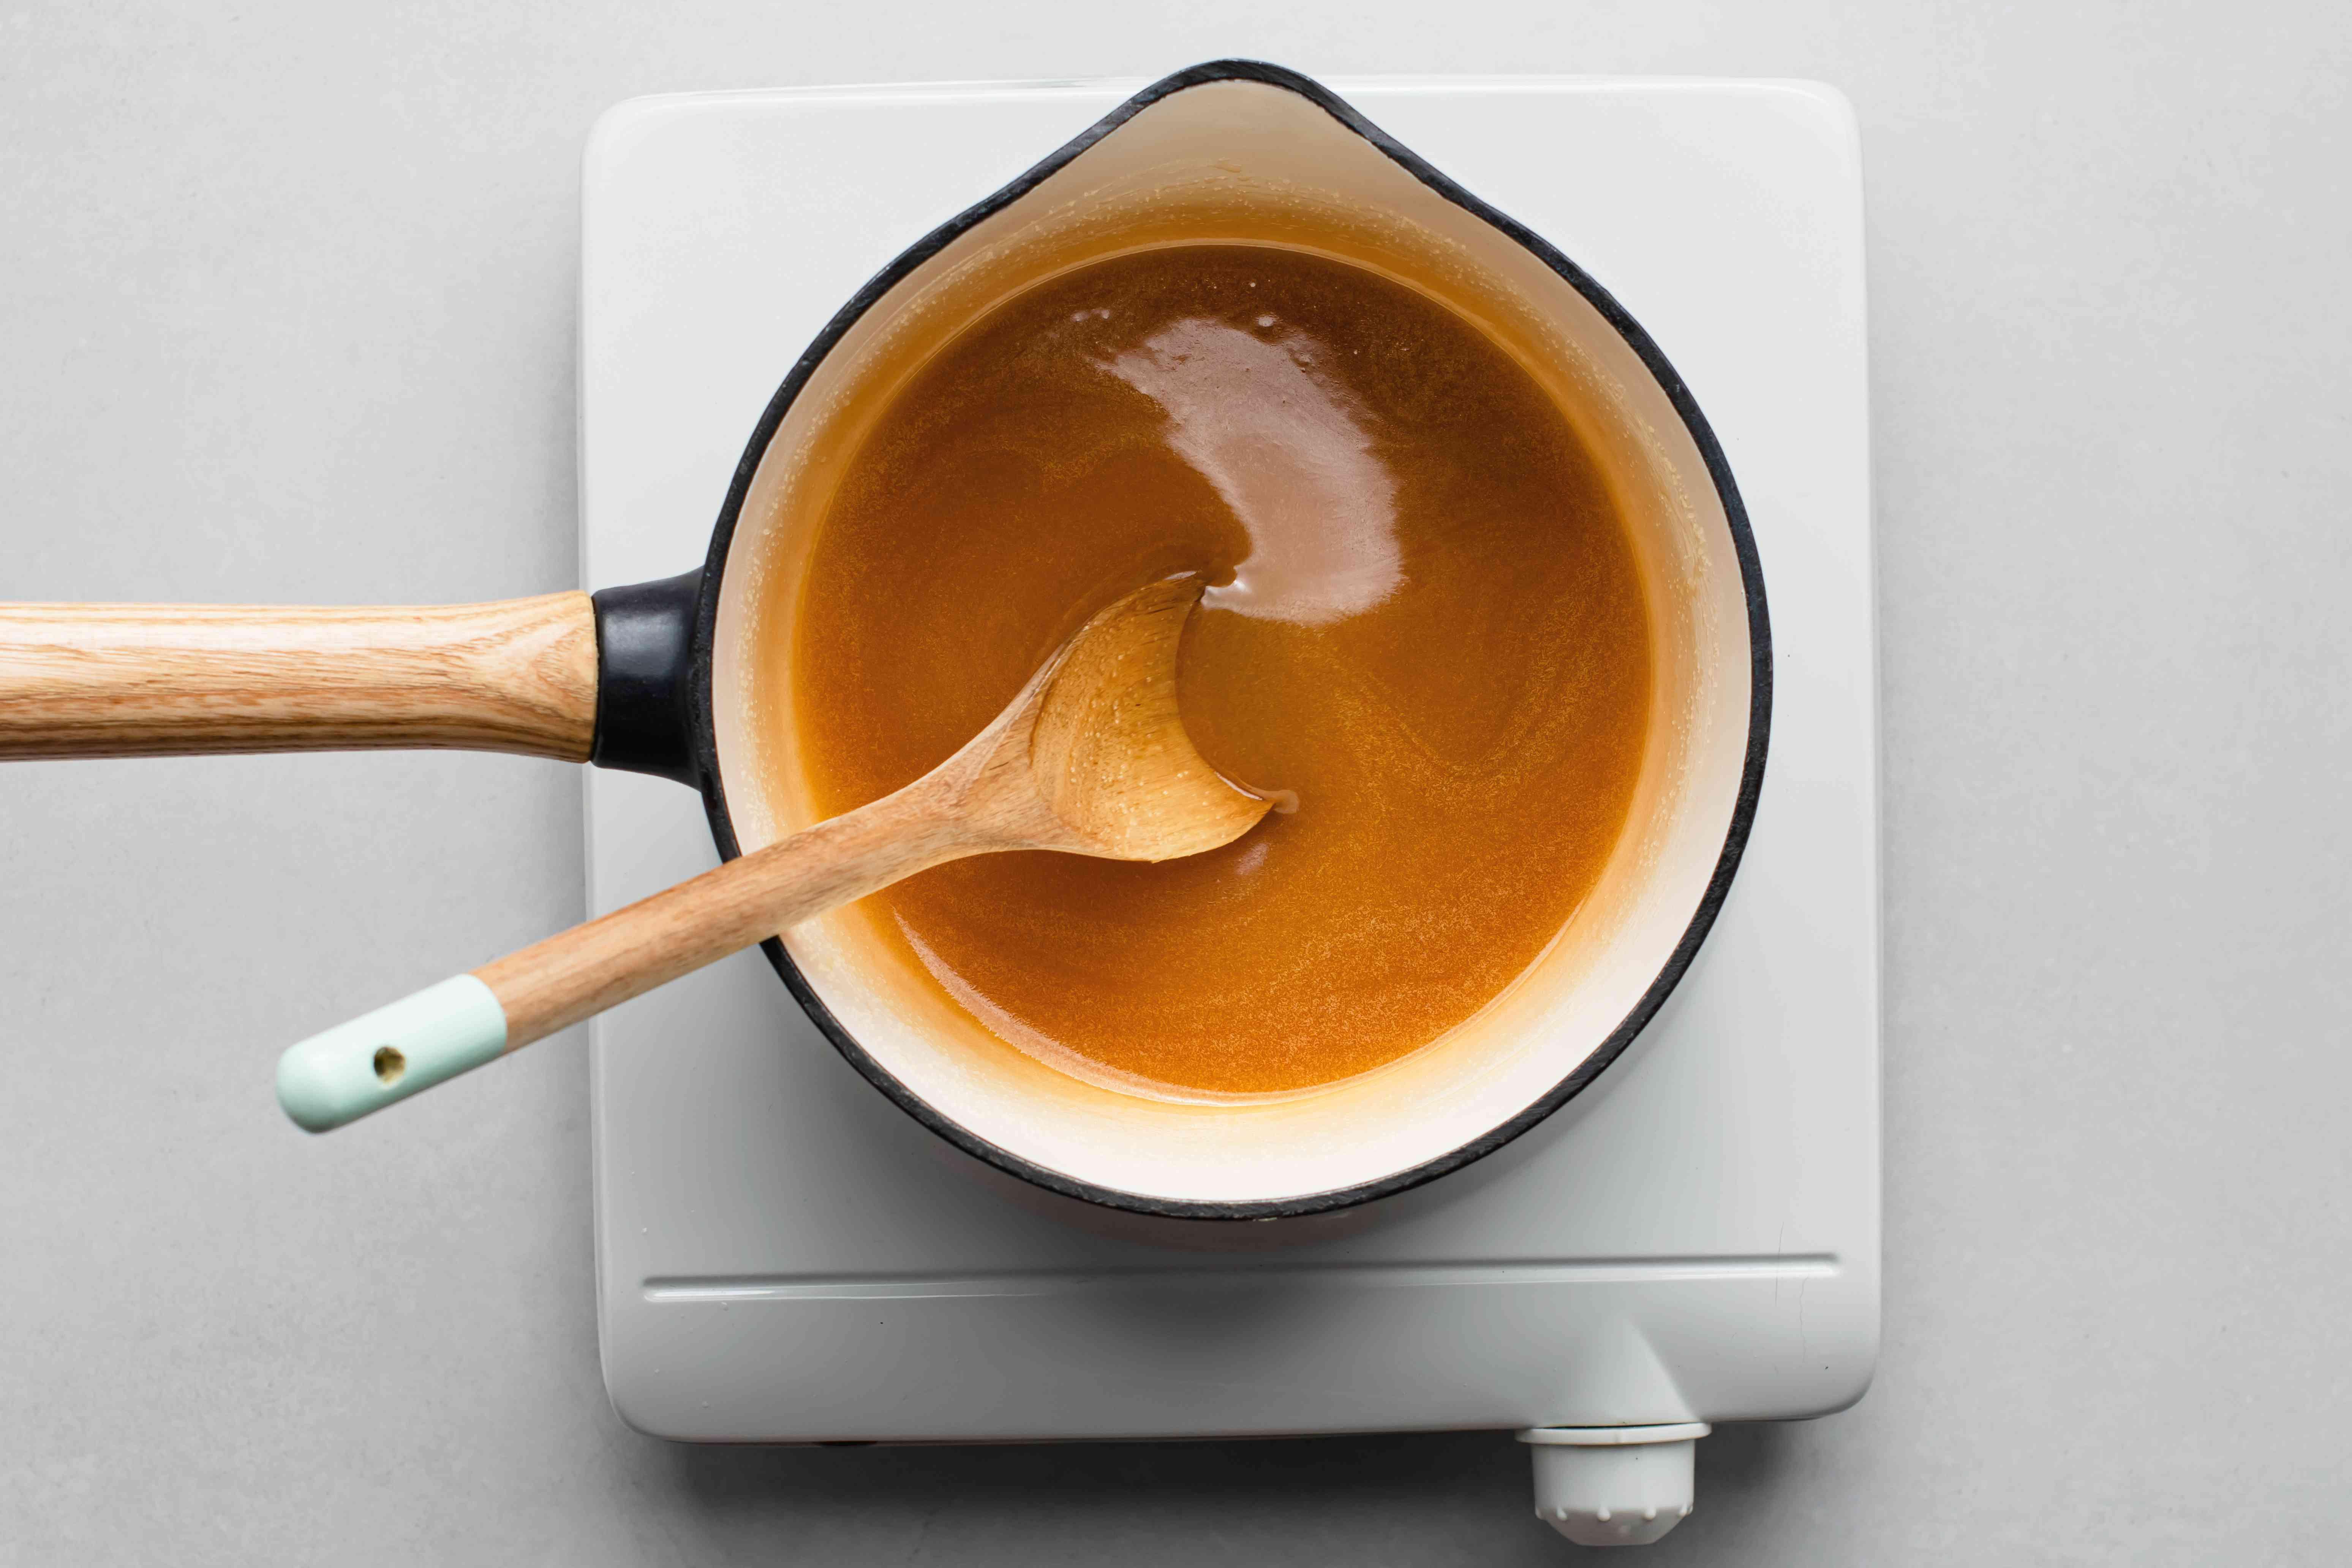 Melting butter, sugar and vanilla in a saucepan